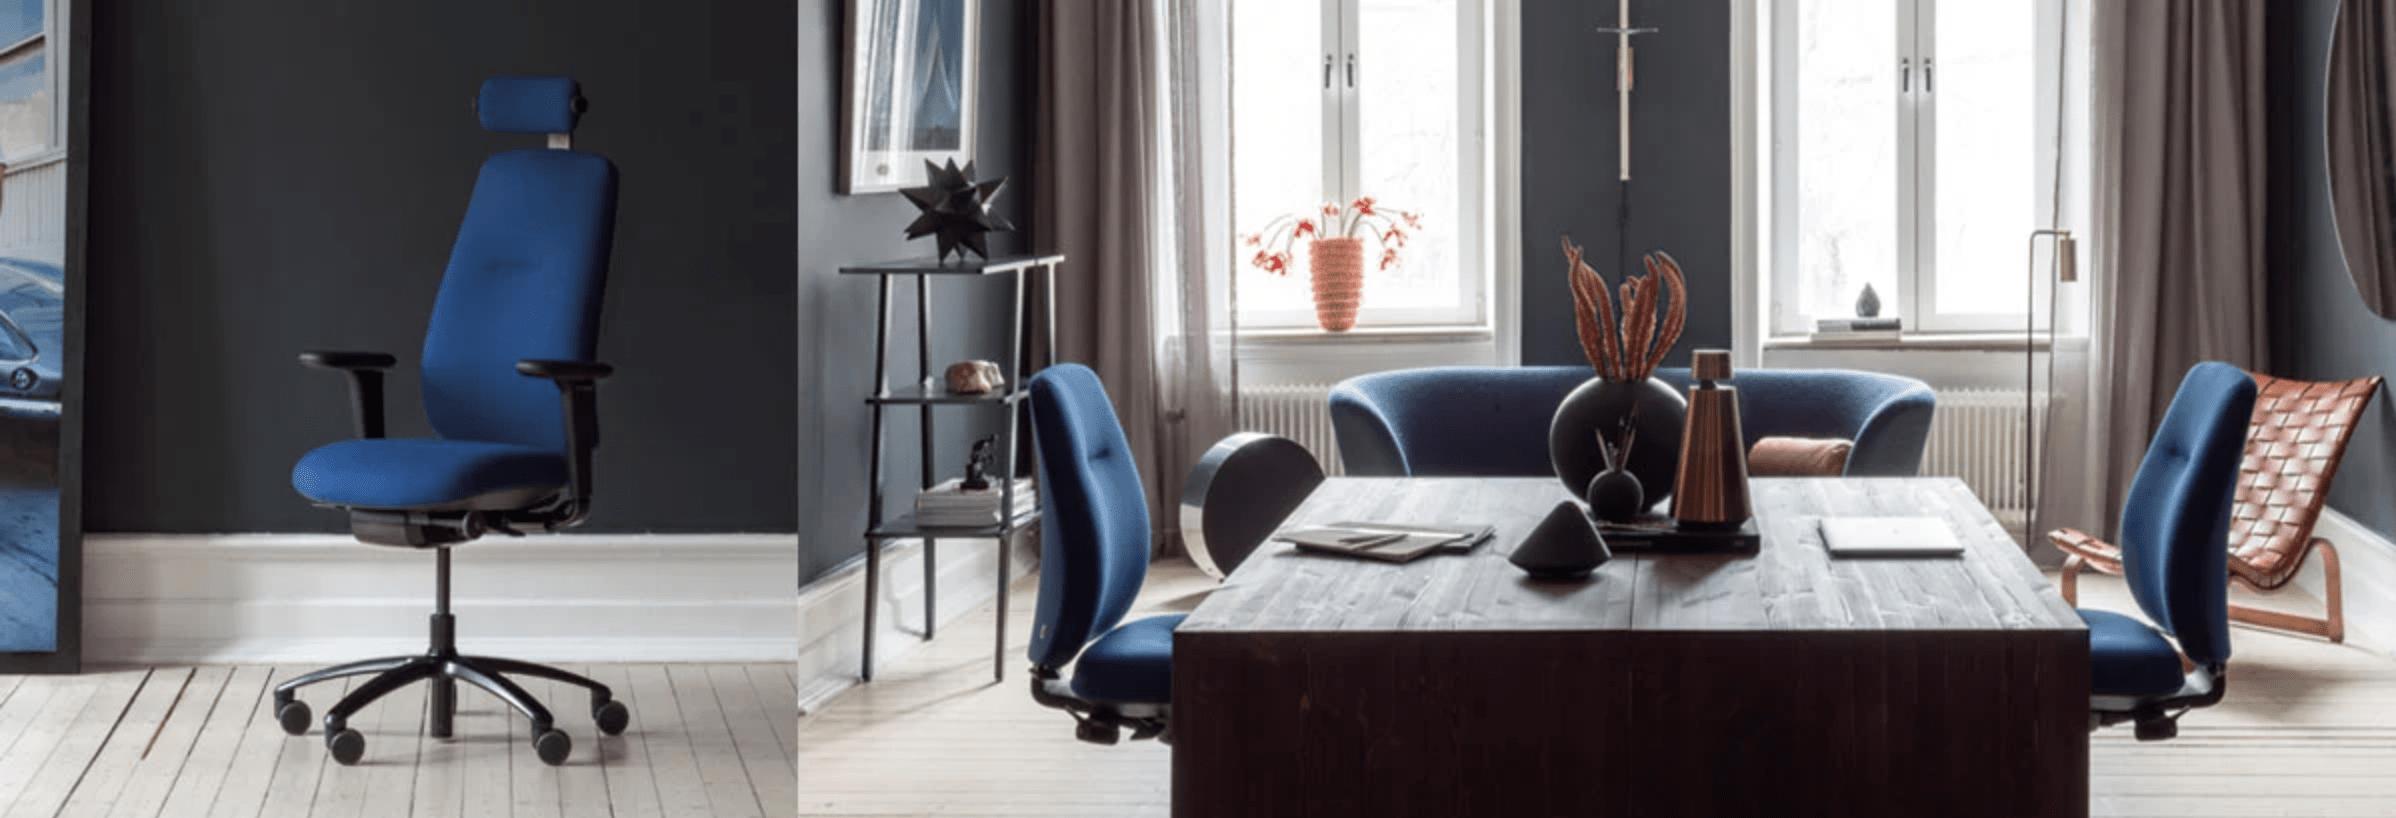 RH Bürostühle‣ solergo.ch